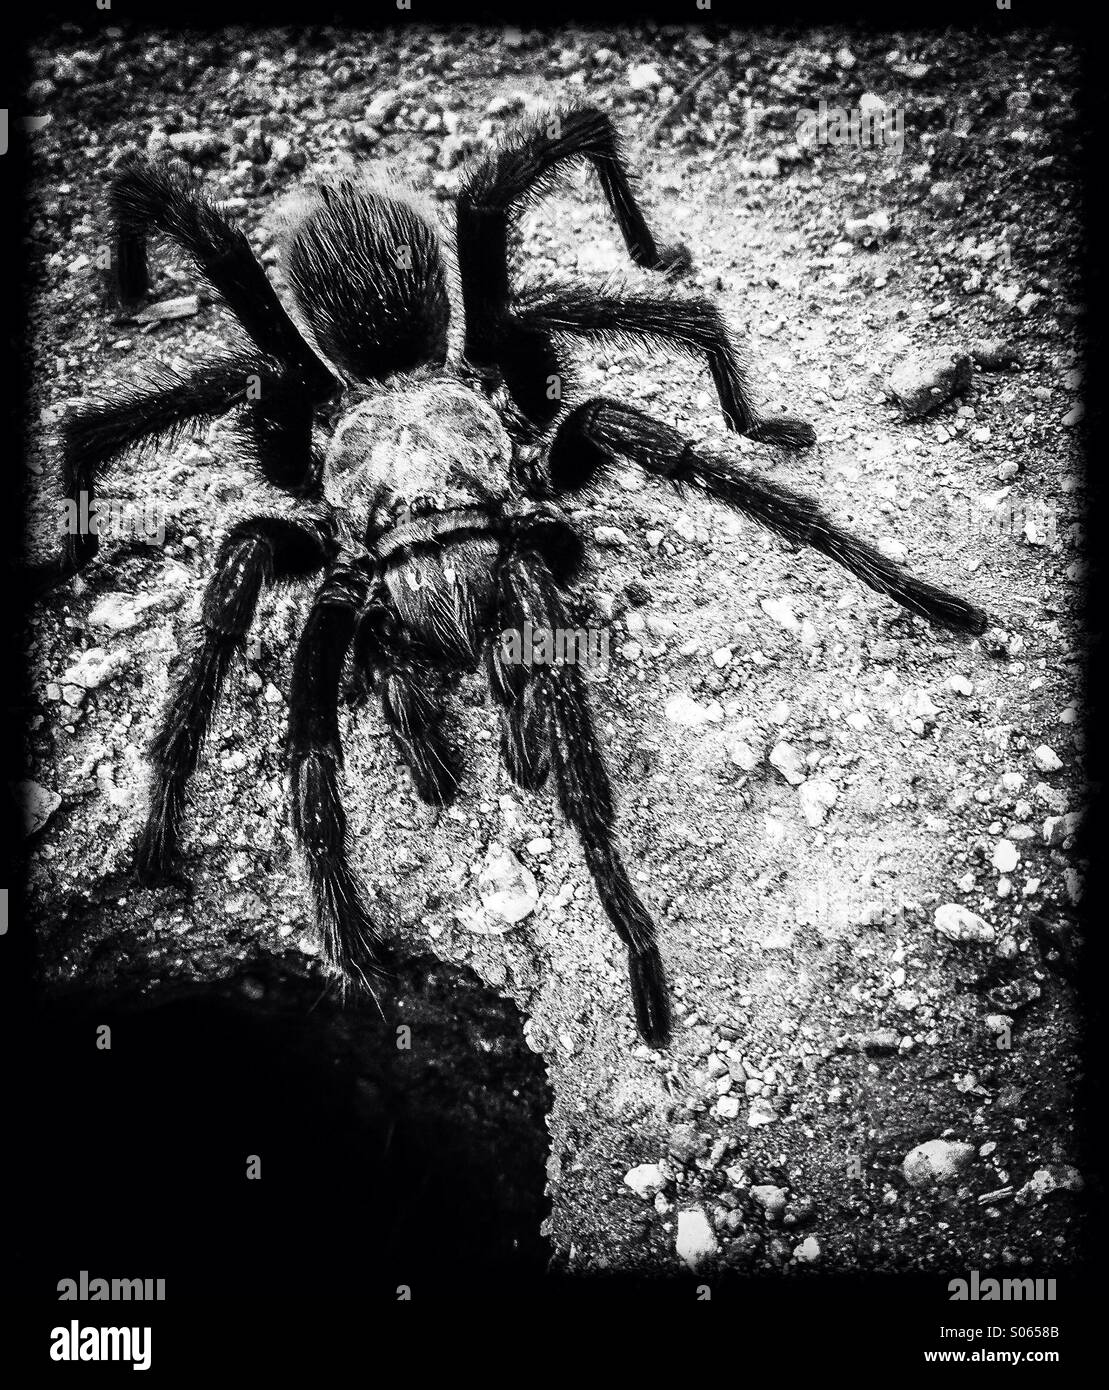 A tarantula creeps across the desert floor. - Stock Image